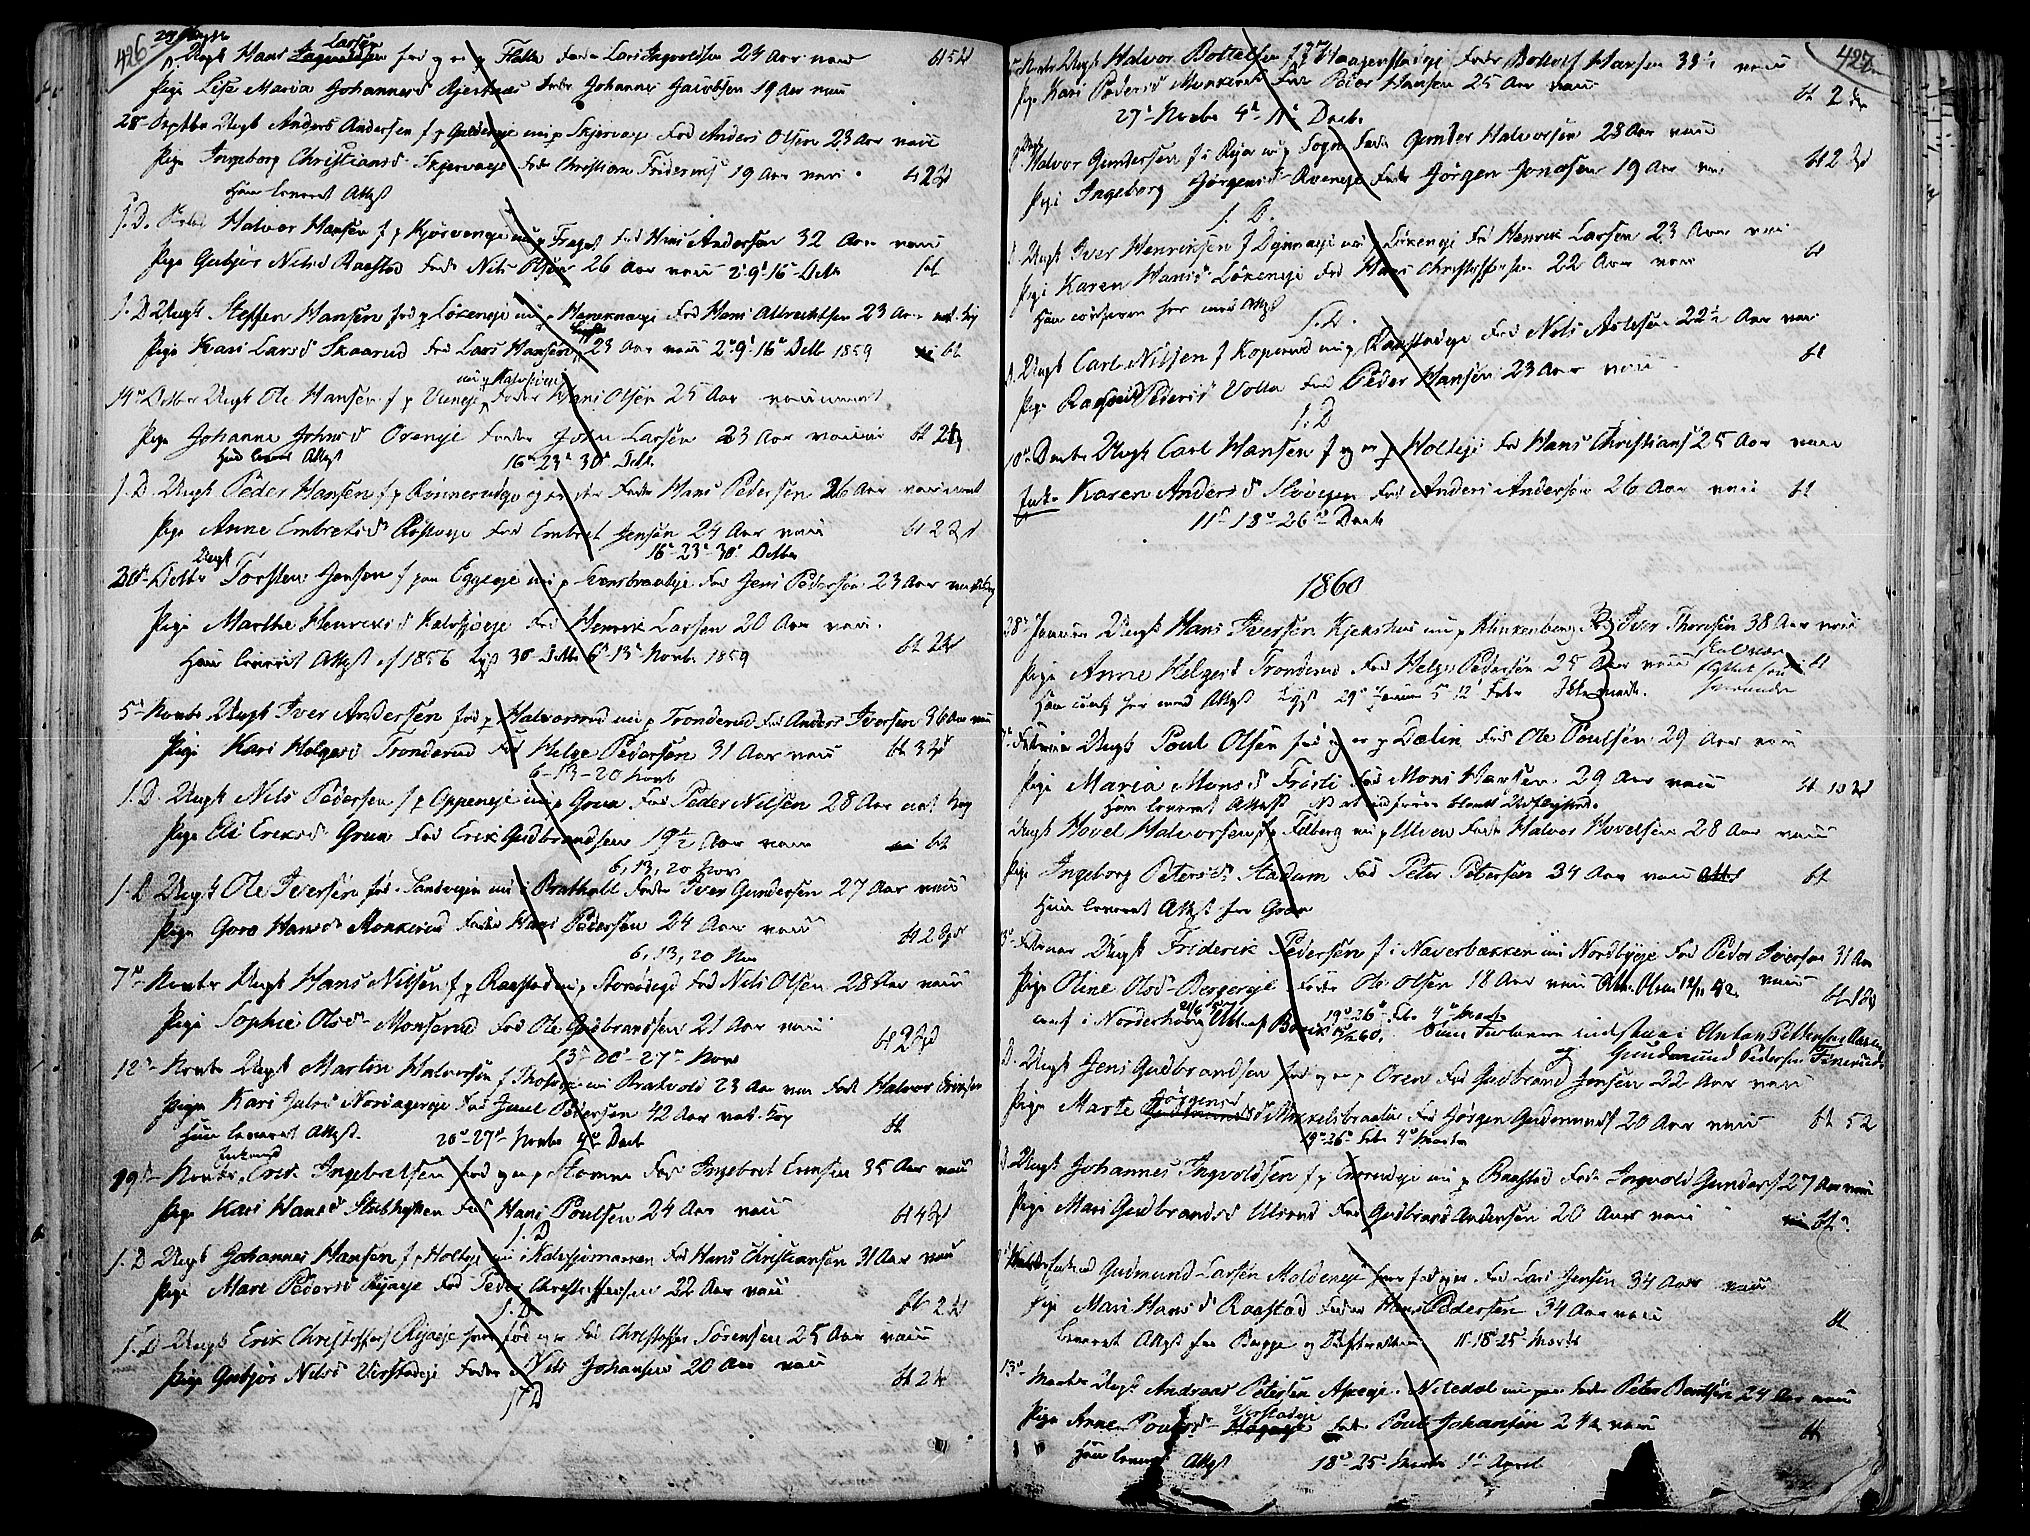 SAH, Jevnaker prestekontor, Ministerialbok nr. 4, 1800-1861, s. 426-427